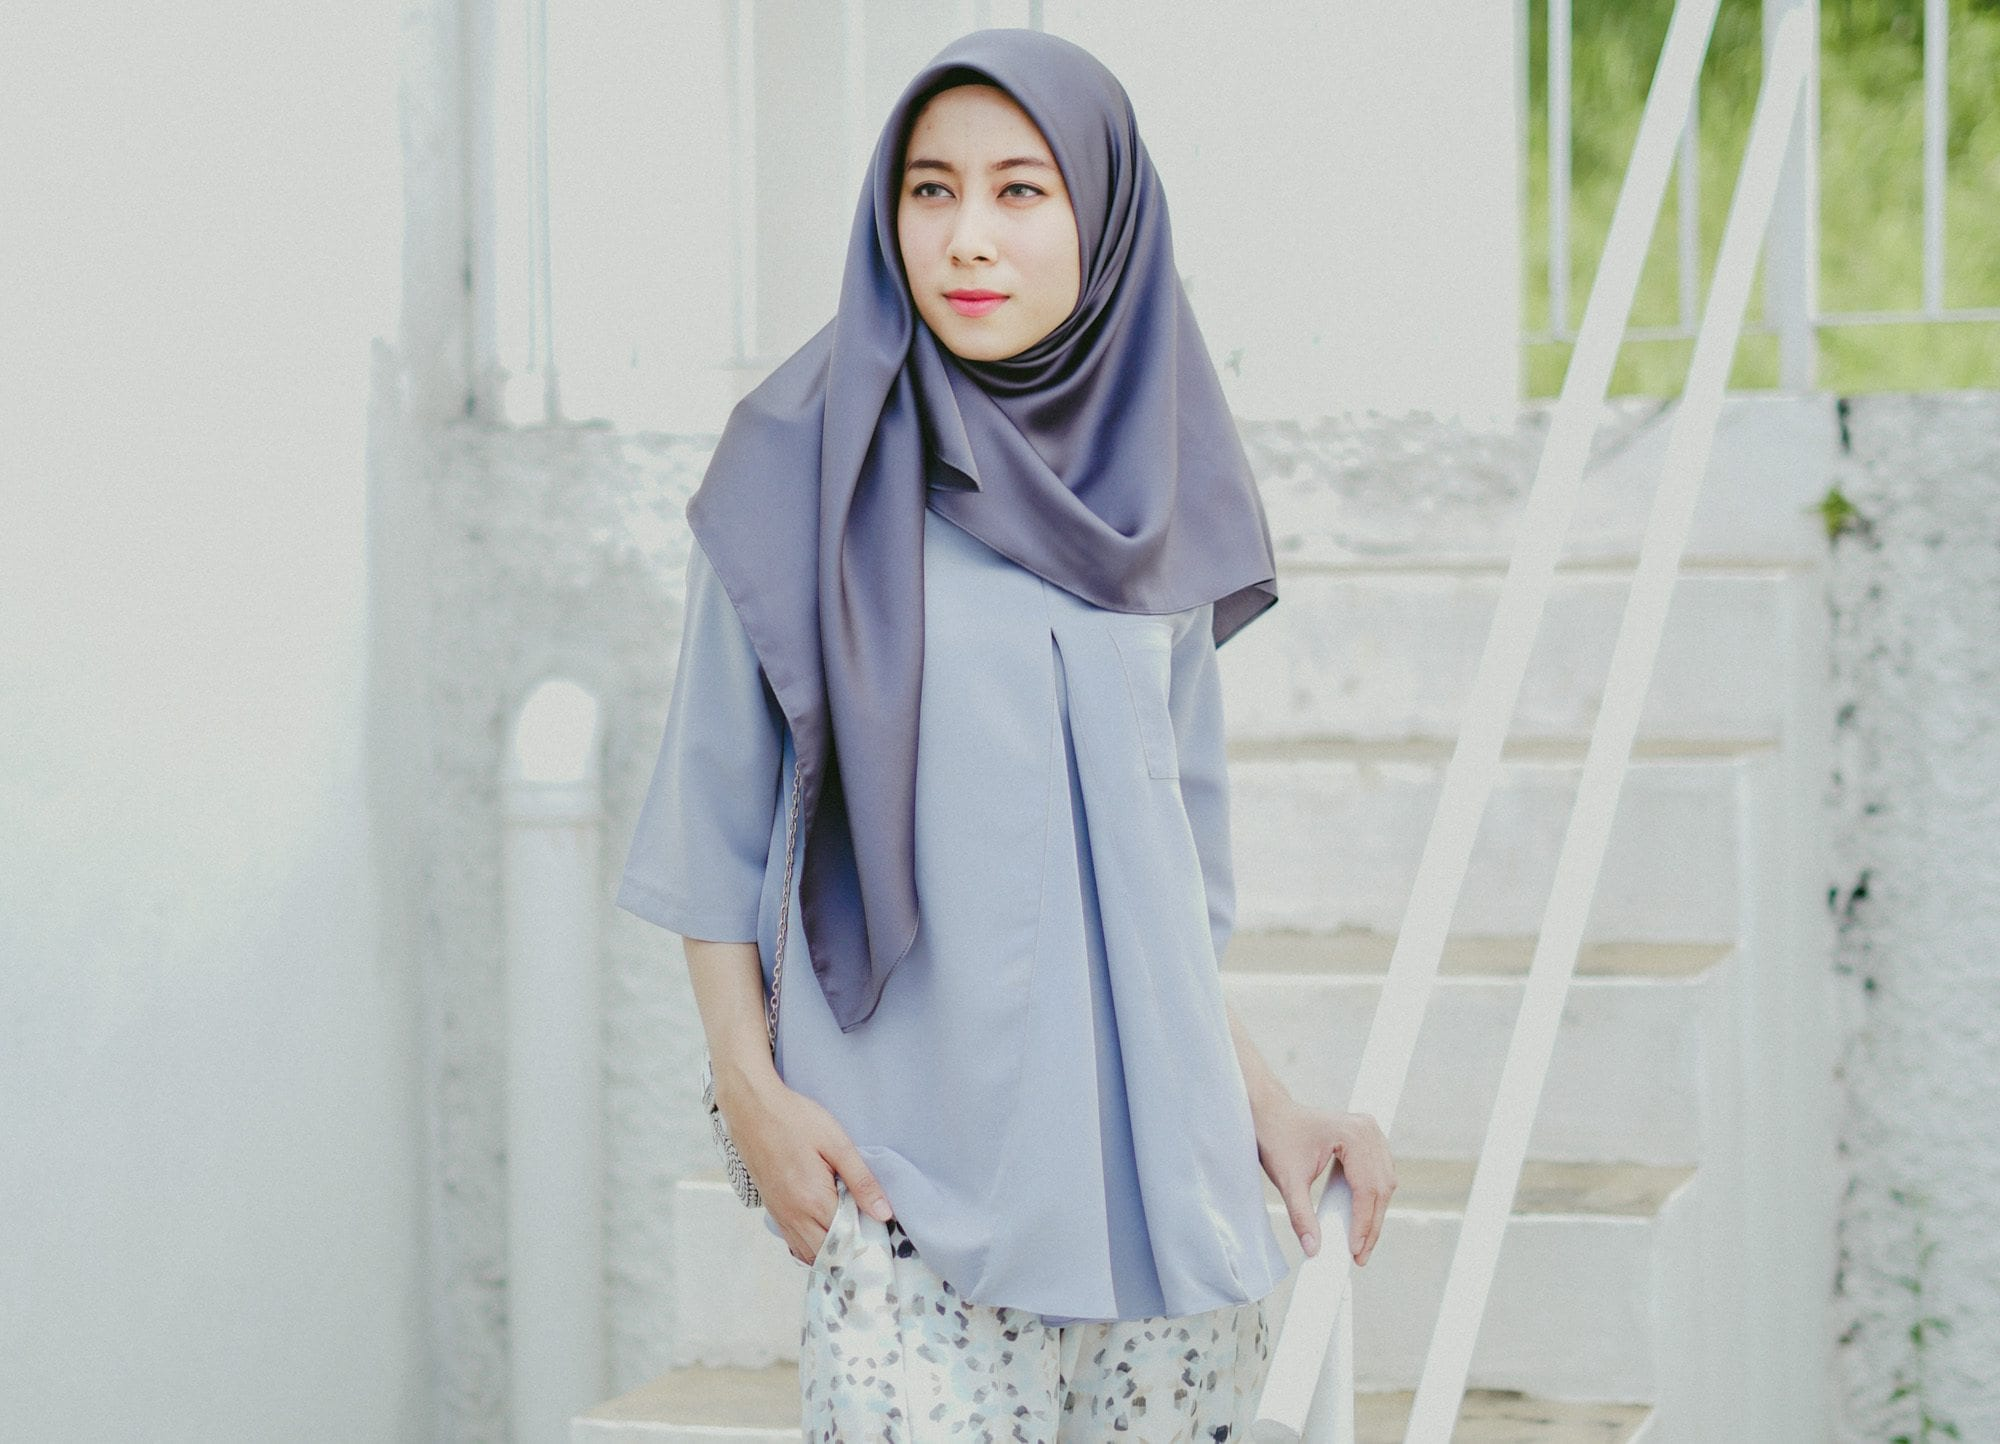 Tutorial Gaya Hijab Untuk Wajah Bulat Yang Simpel Dan 5 Variasinya